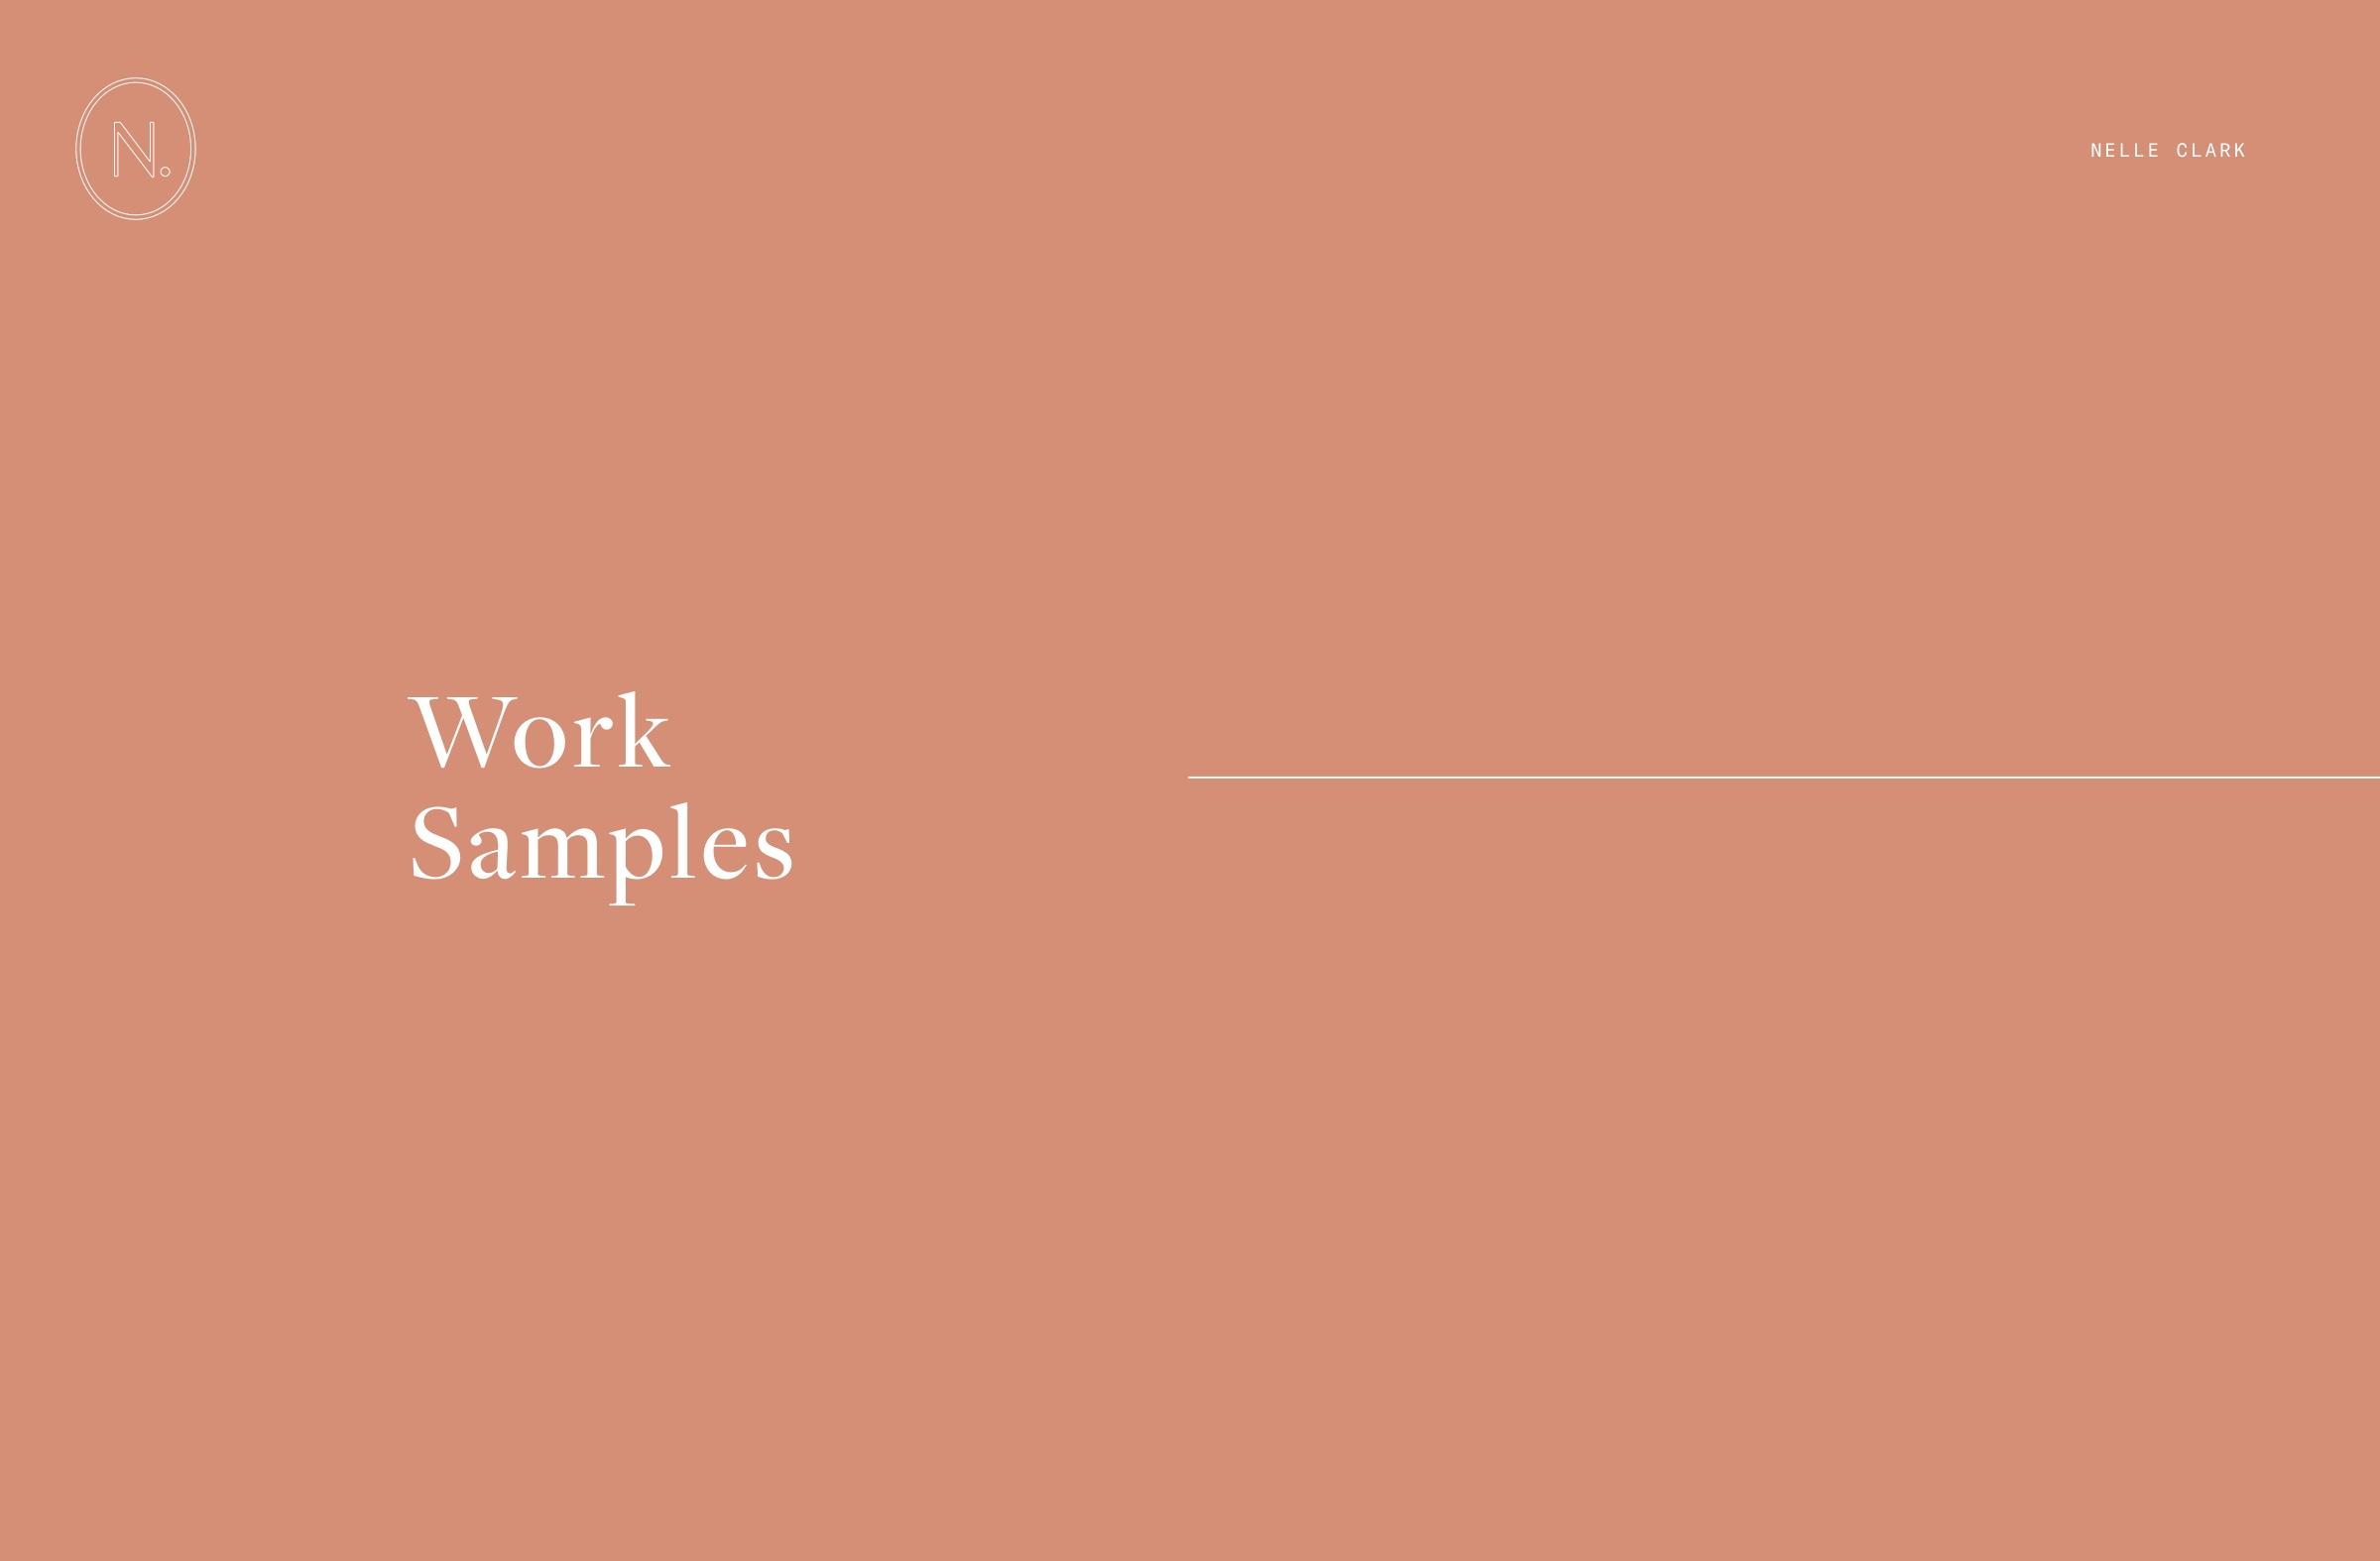 Work Samples.jpg